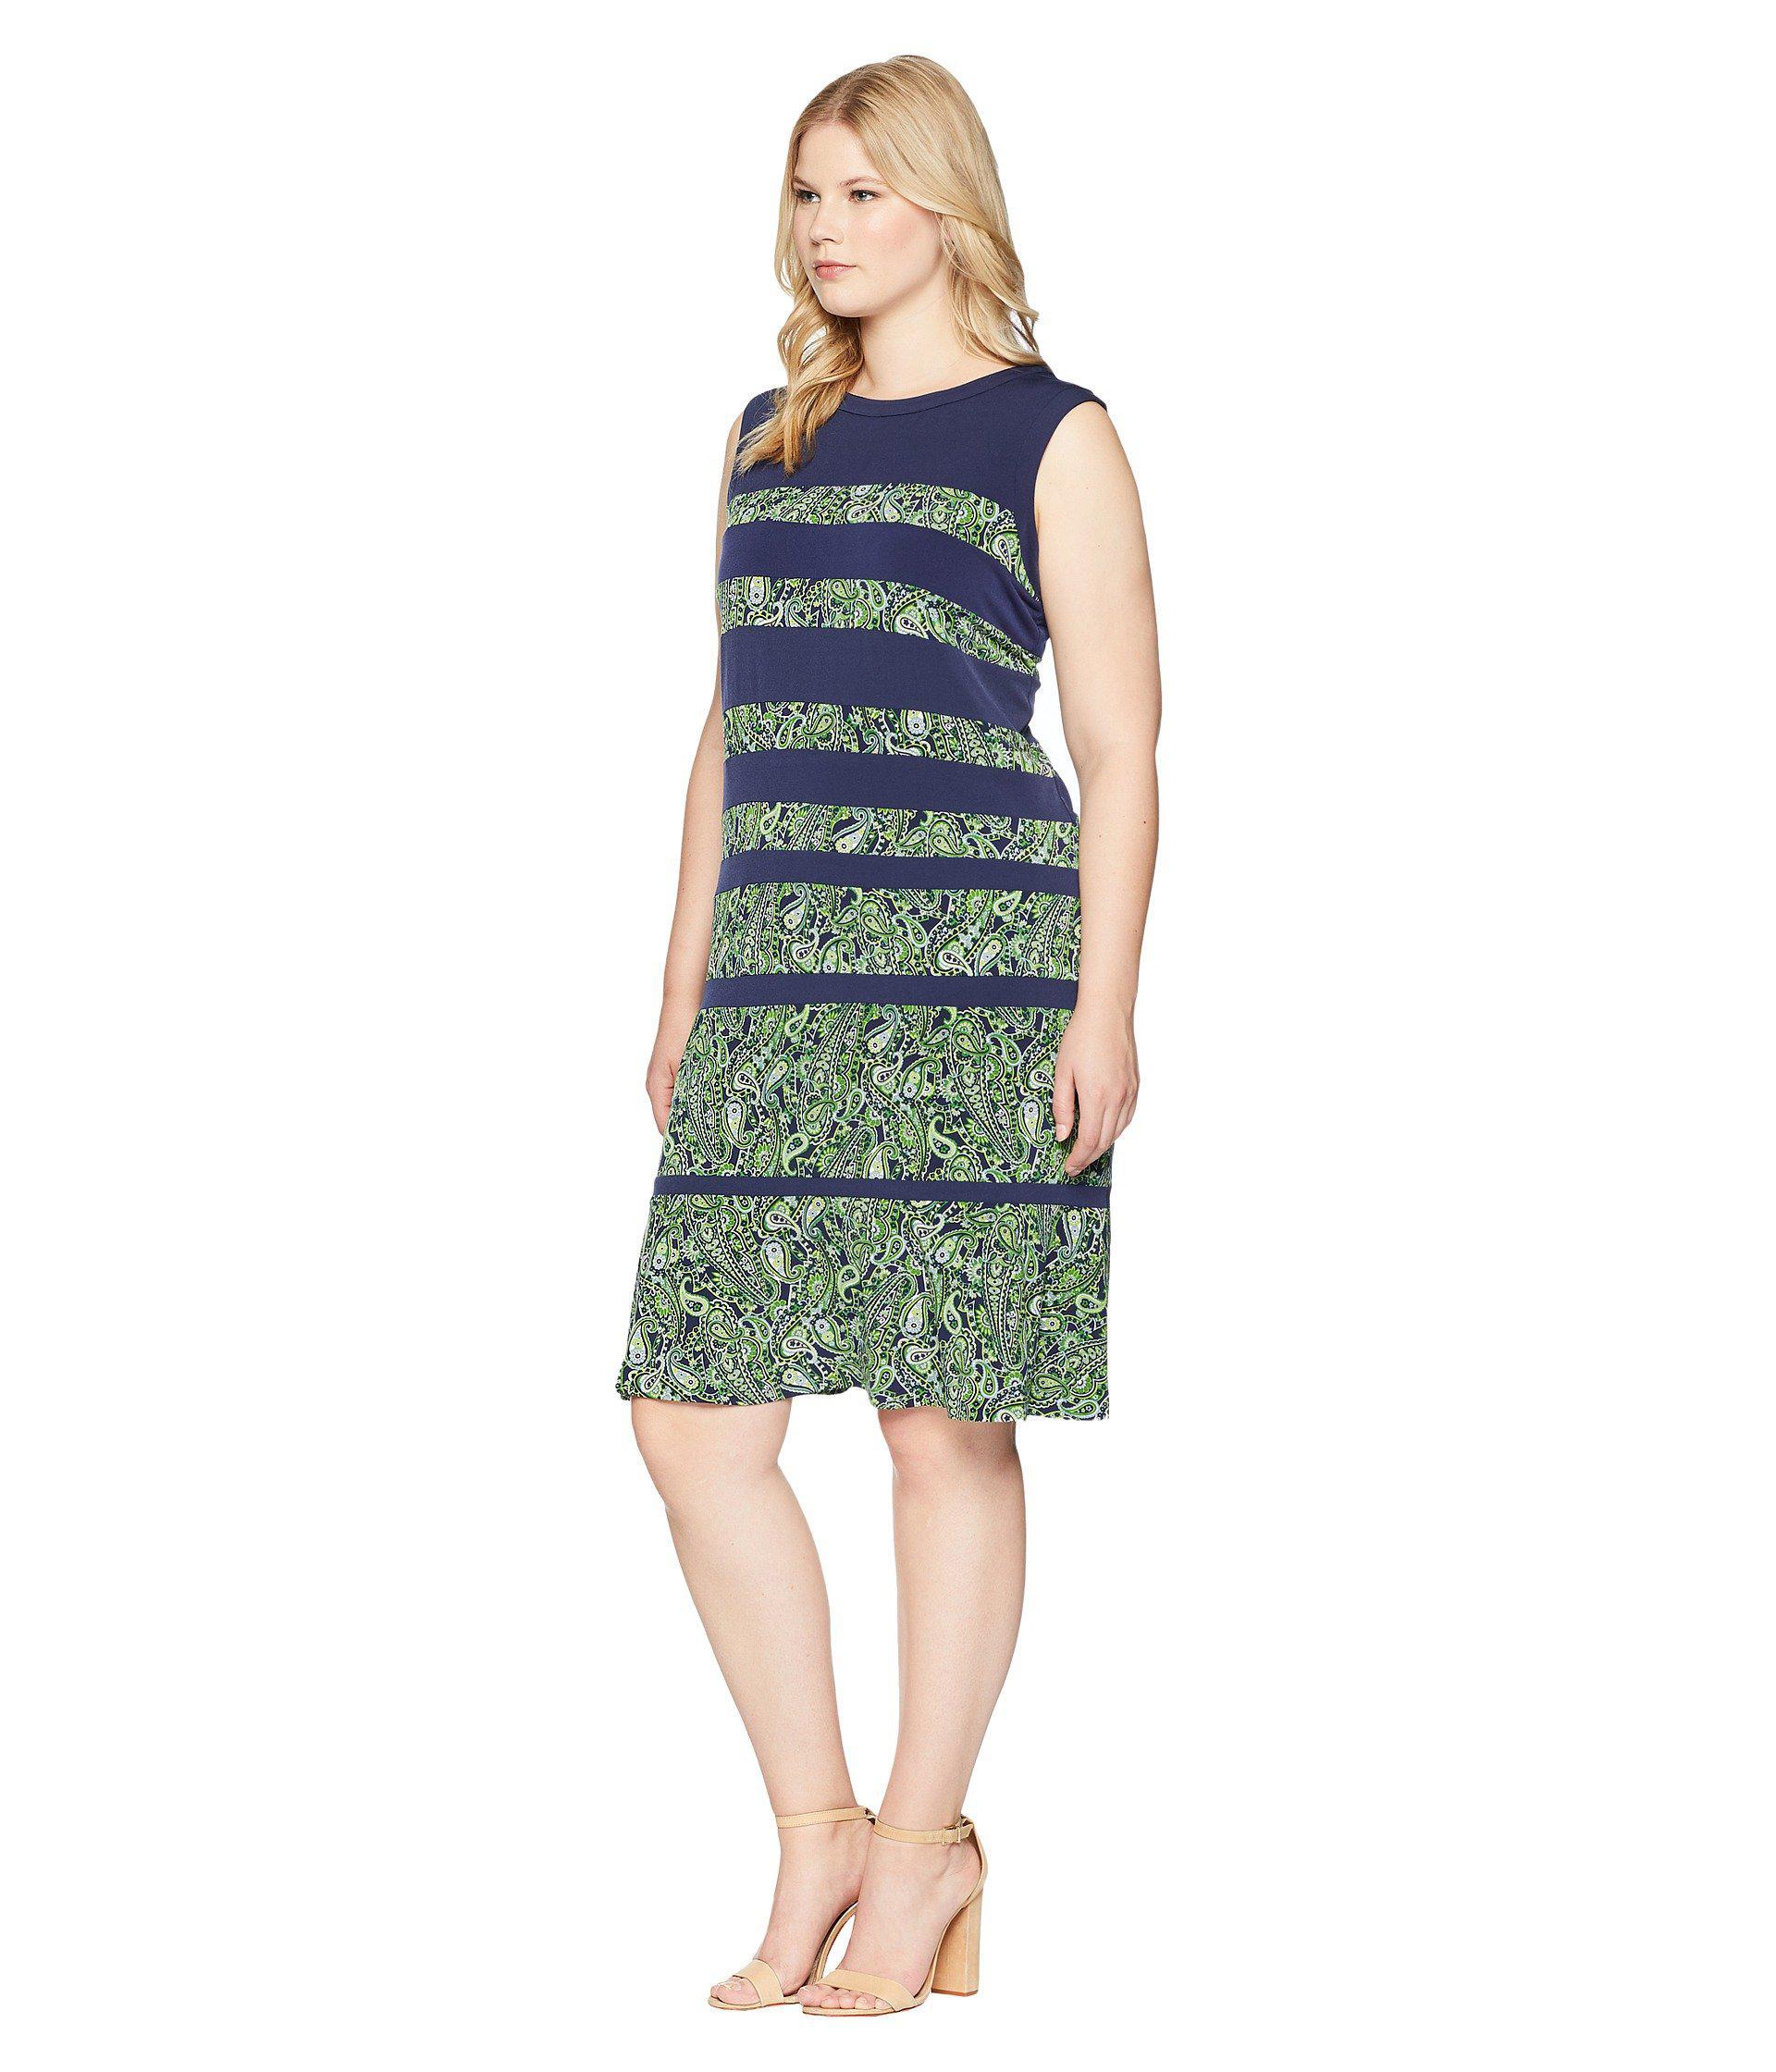 46ec0c7dc7f3a Lyst - MICHAEL Michael Kors Plus Size Paisley Paneled Sleeveless Dress in  Green - Save 43%